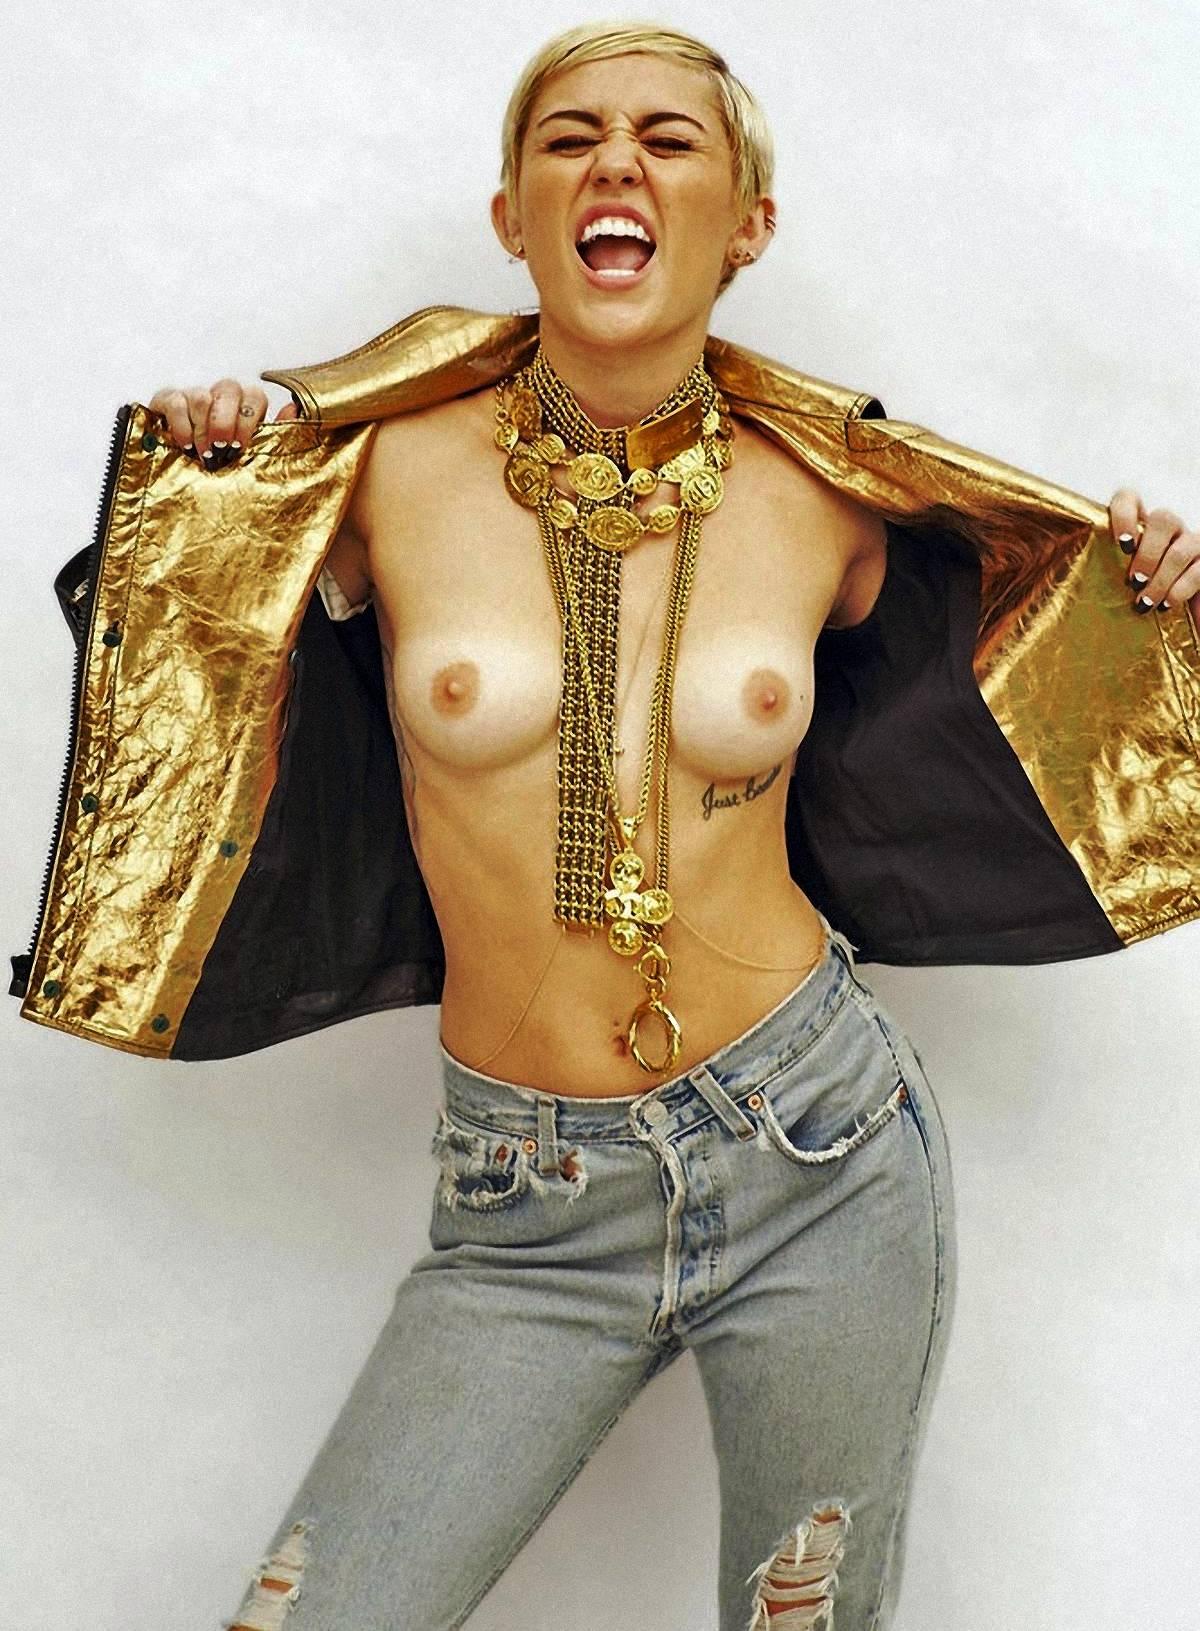 Mileys Tits photo 9